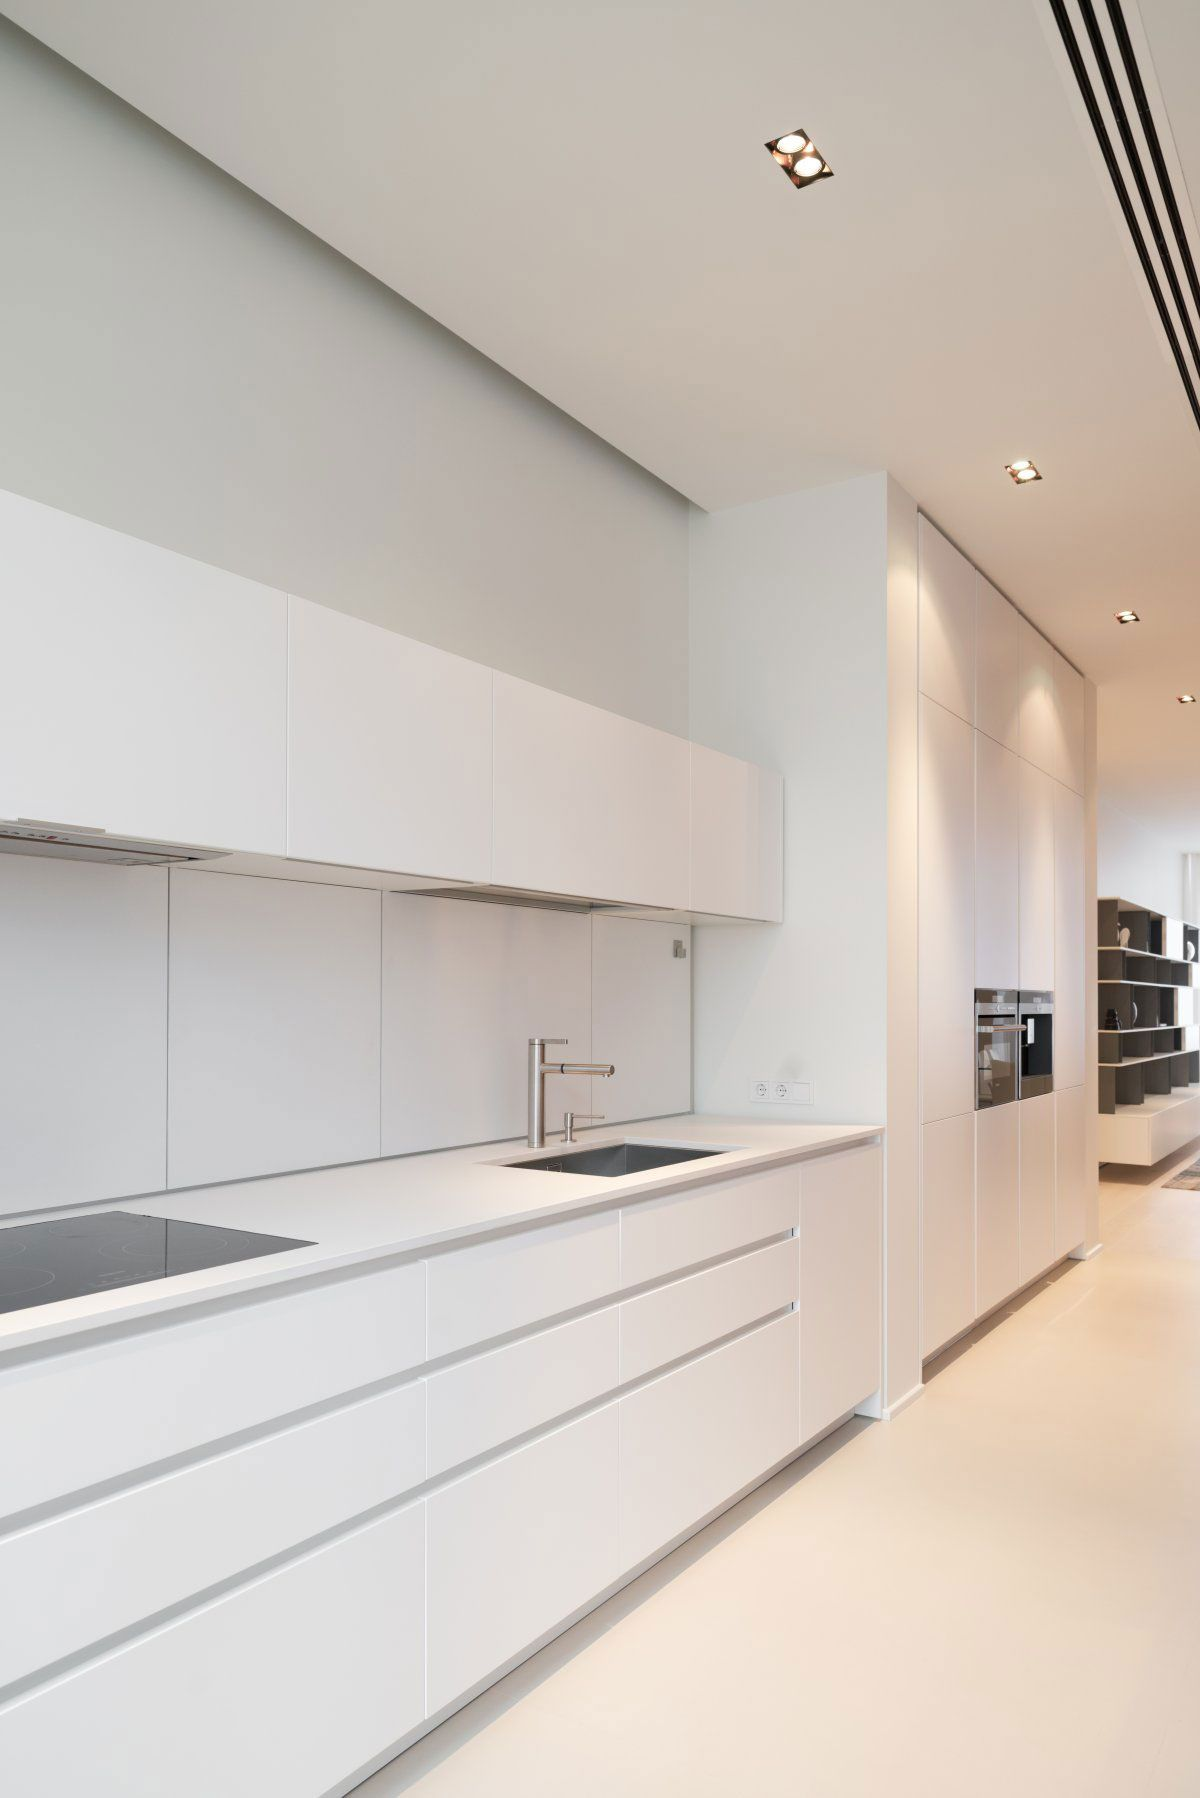 New Arbat Apartment By Sl Project 9 Homedsgn White Modern Kitchen Minimalist Interior Design Minimalist Bedroom Furniture